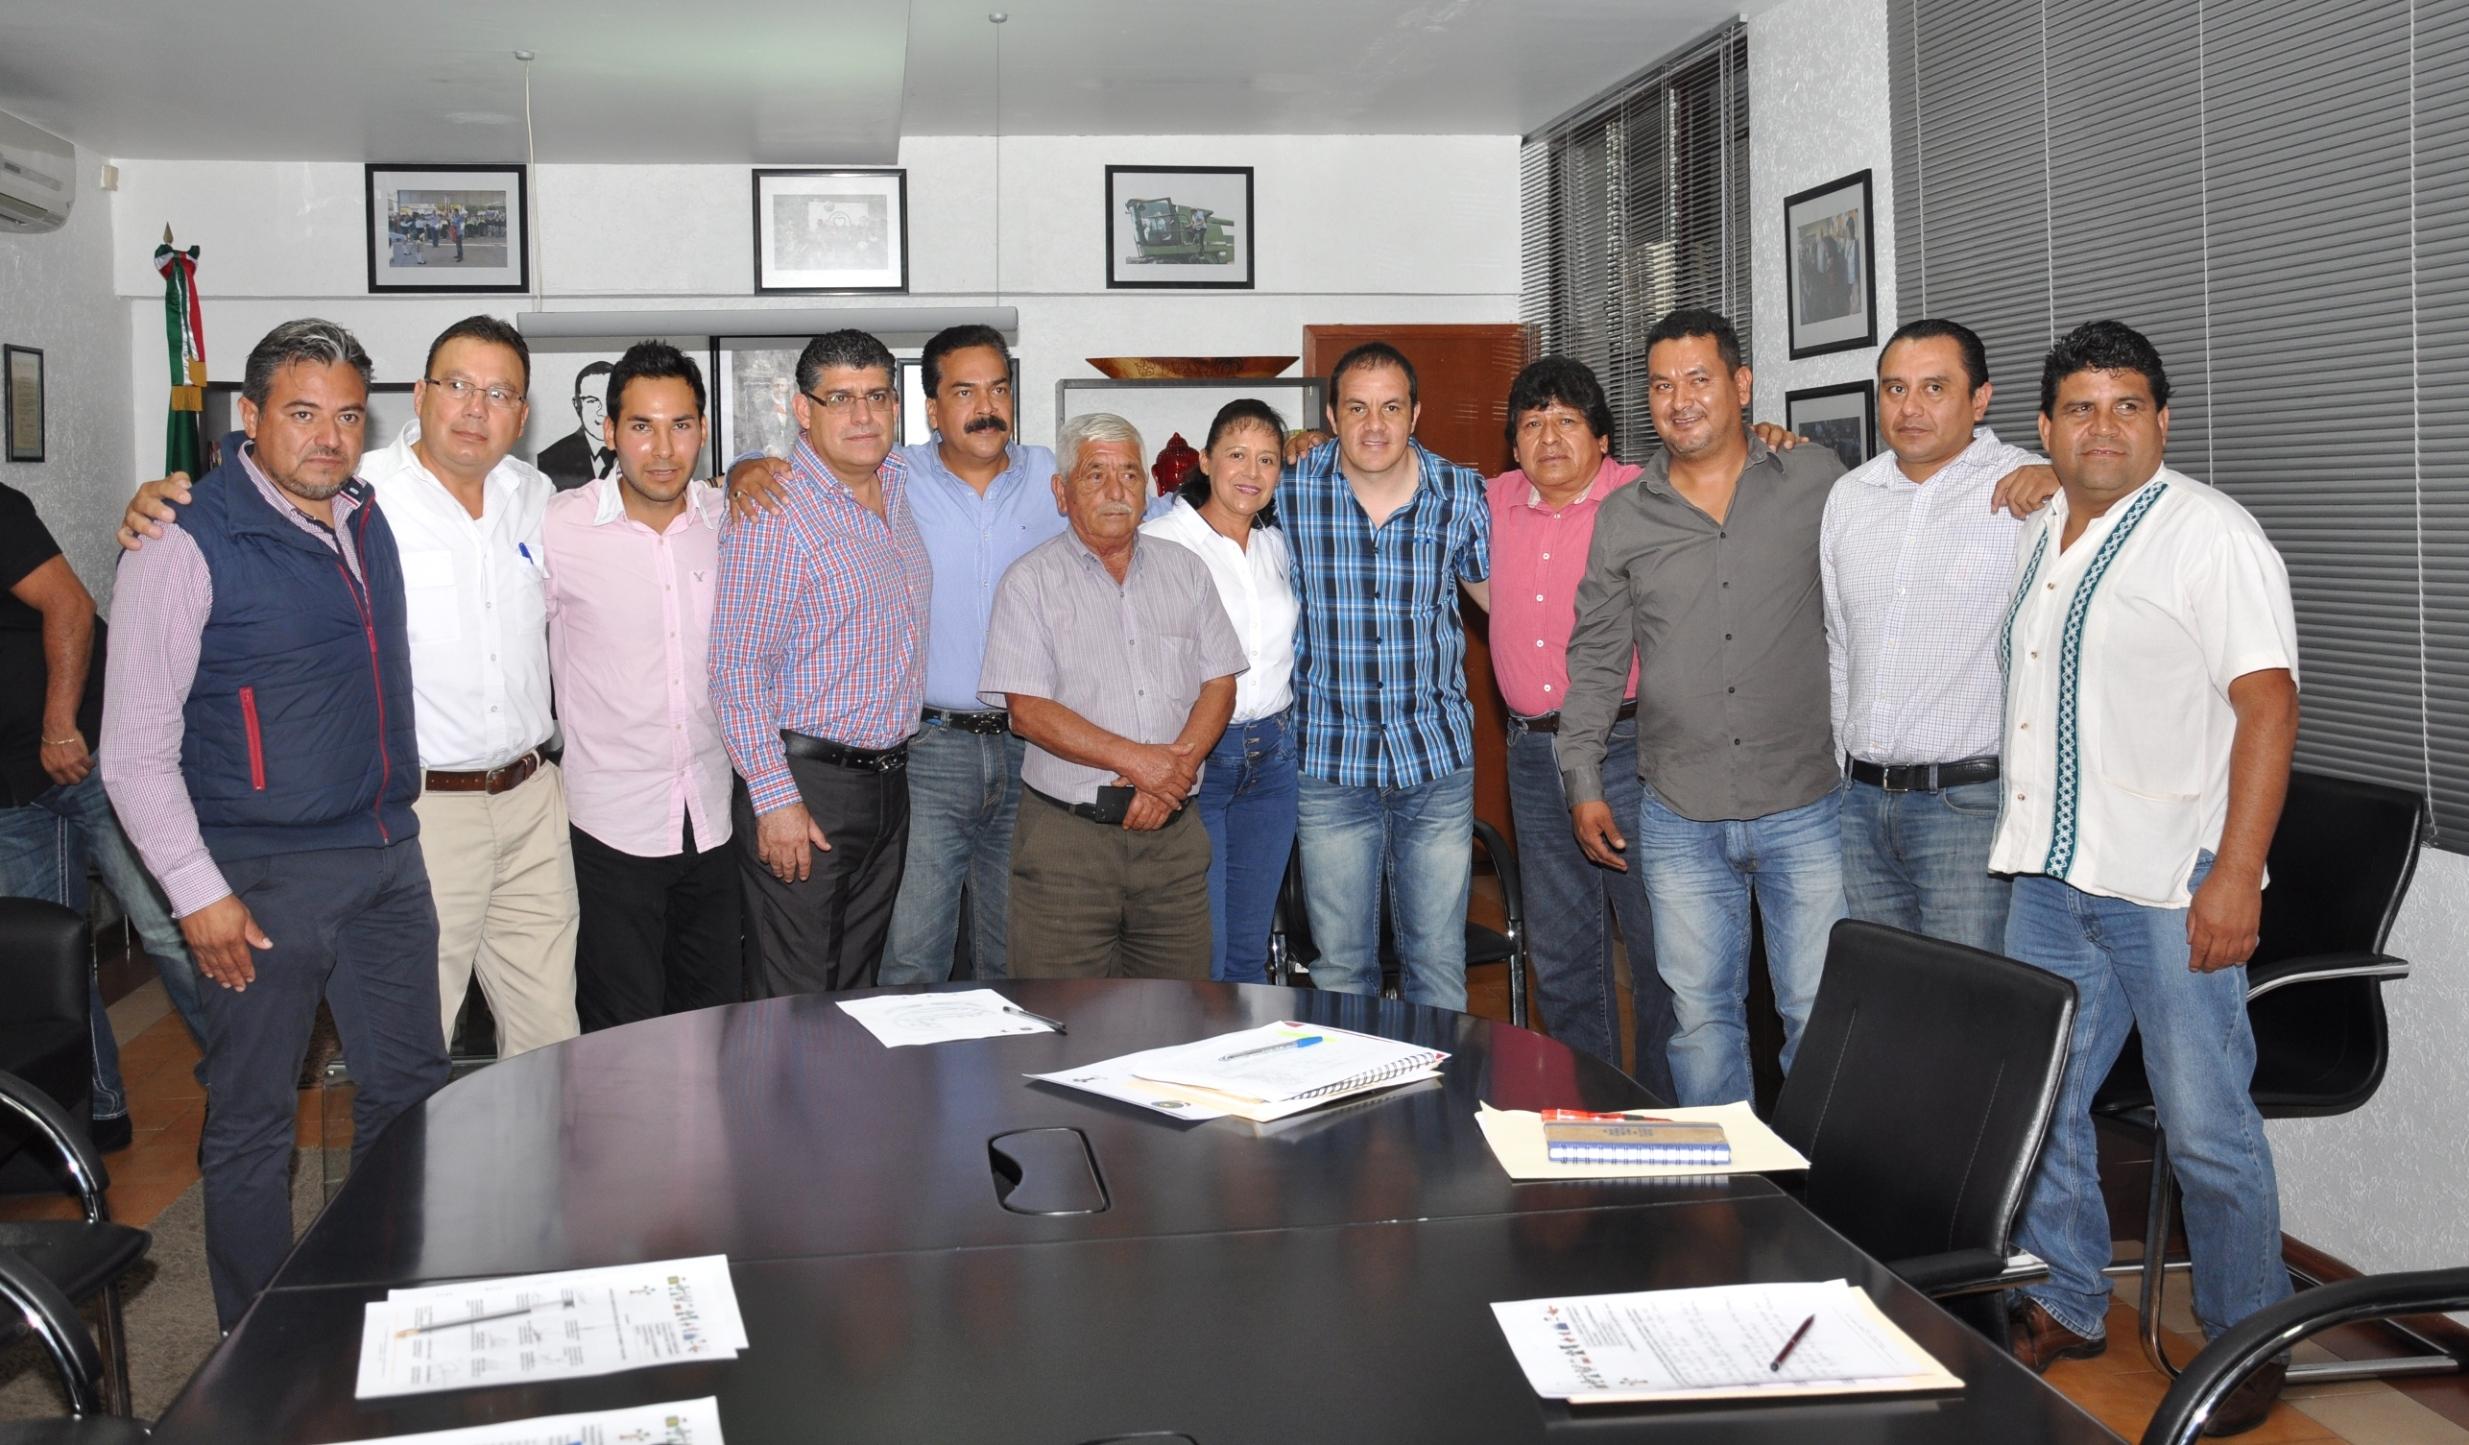 Tlaltenango Ahuatepec